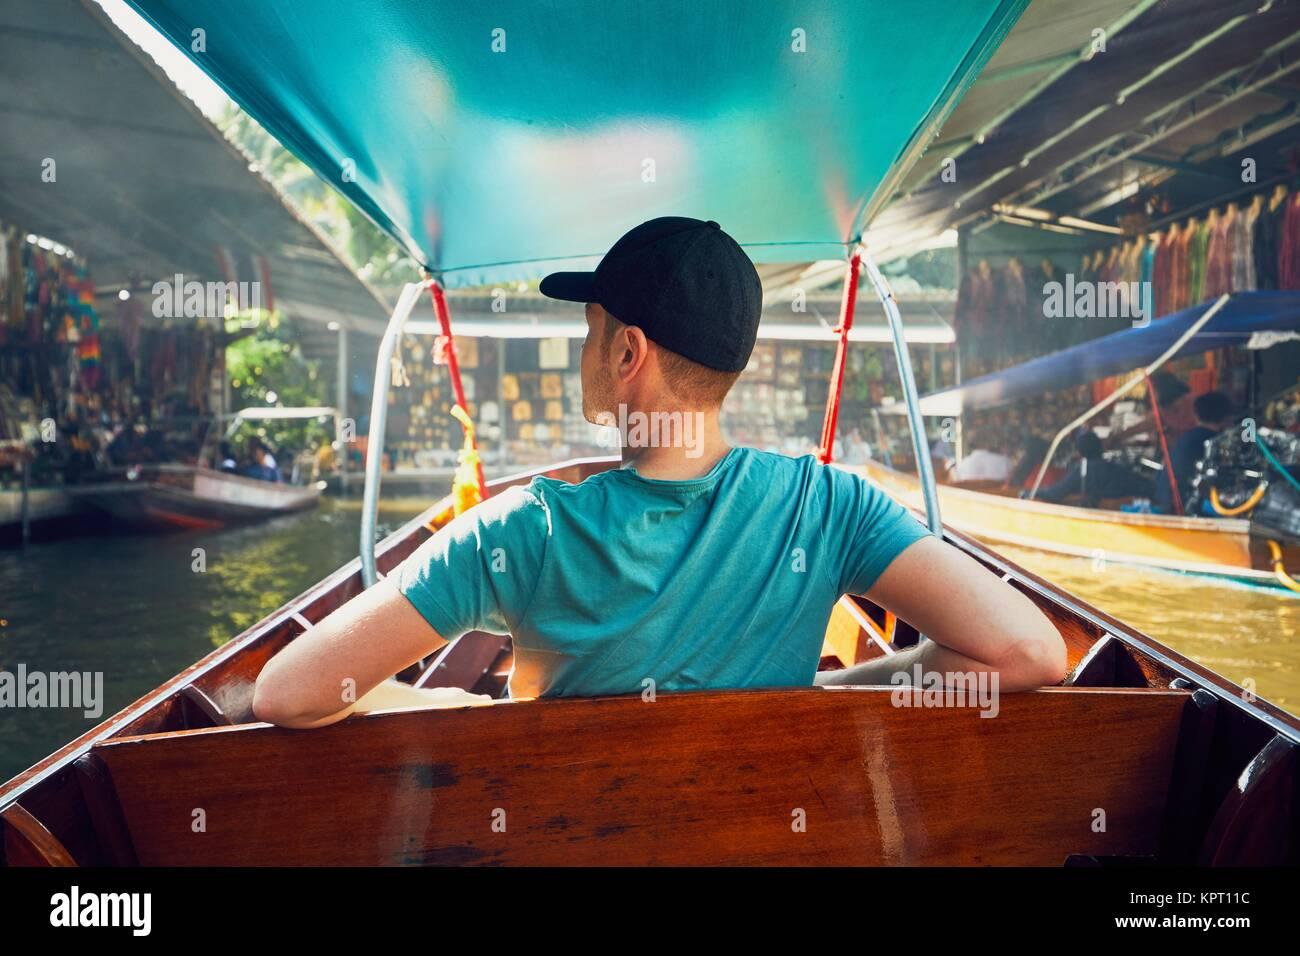 Young man (traveler) on the boat. Traditional floating market Damnoen Saduak in Ratchaburi near Bangkok, Thailand. - Stock Image